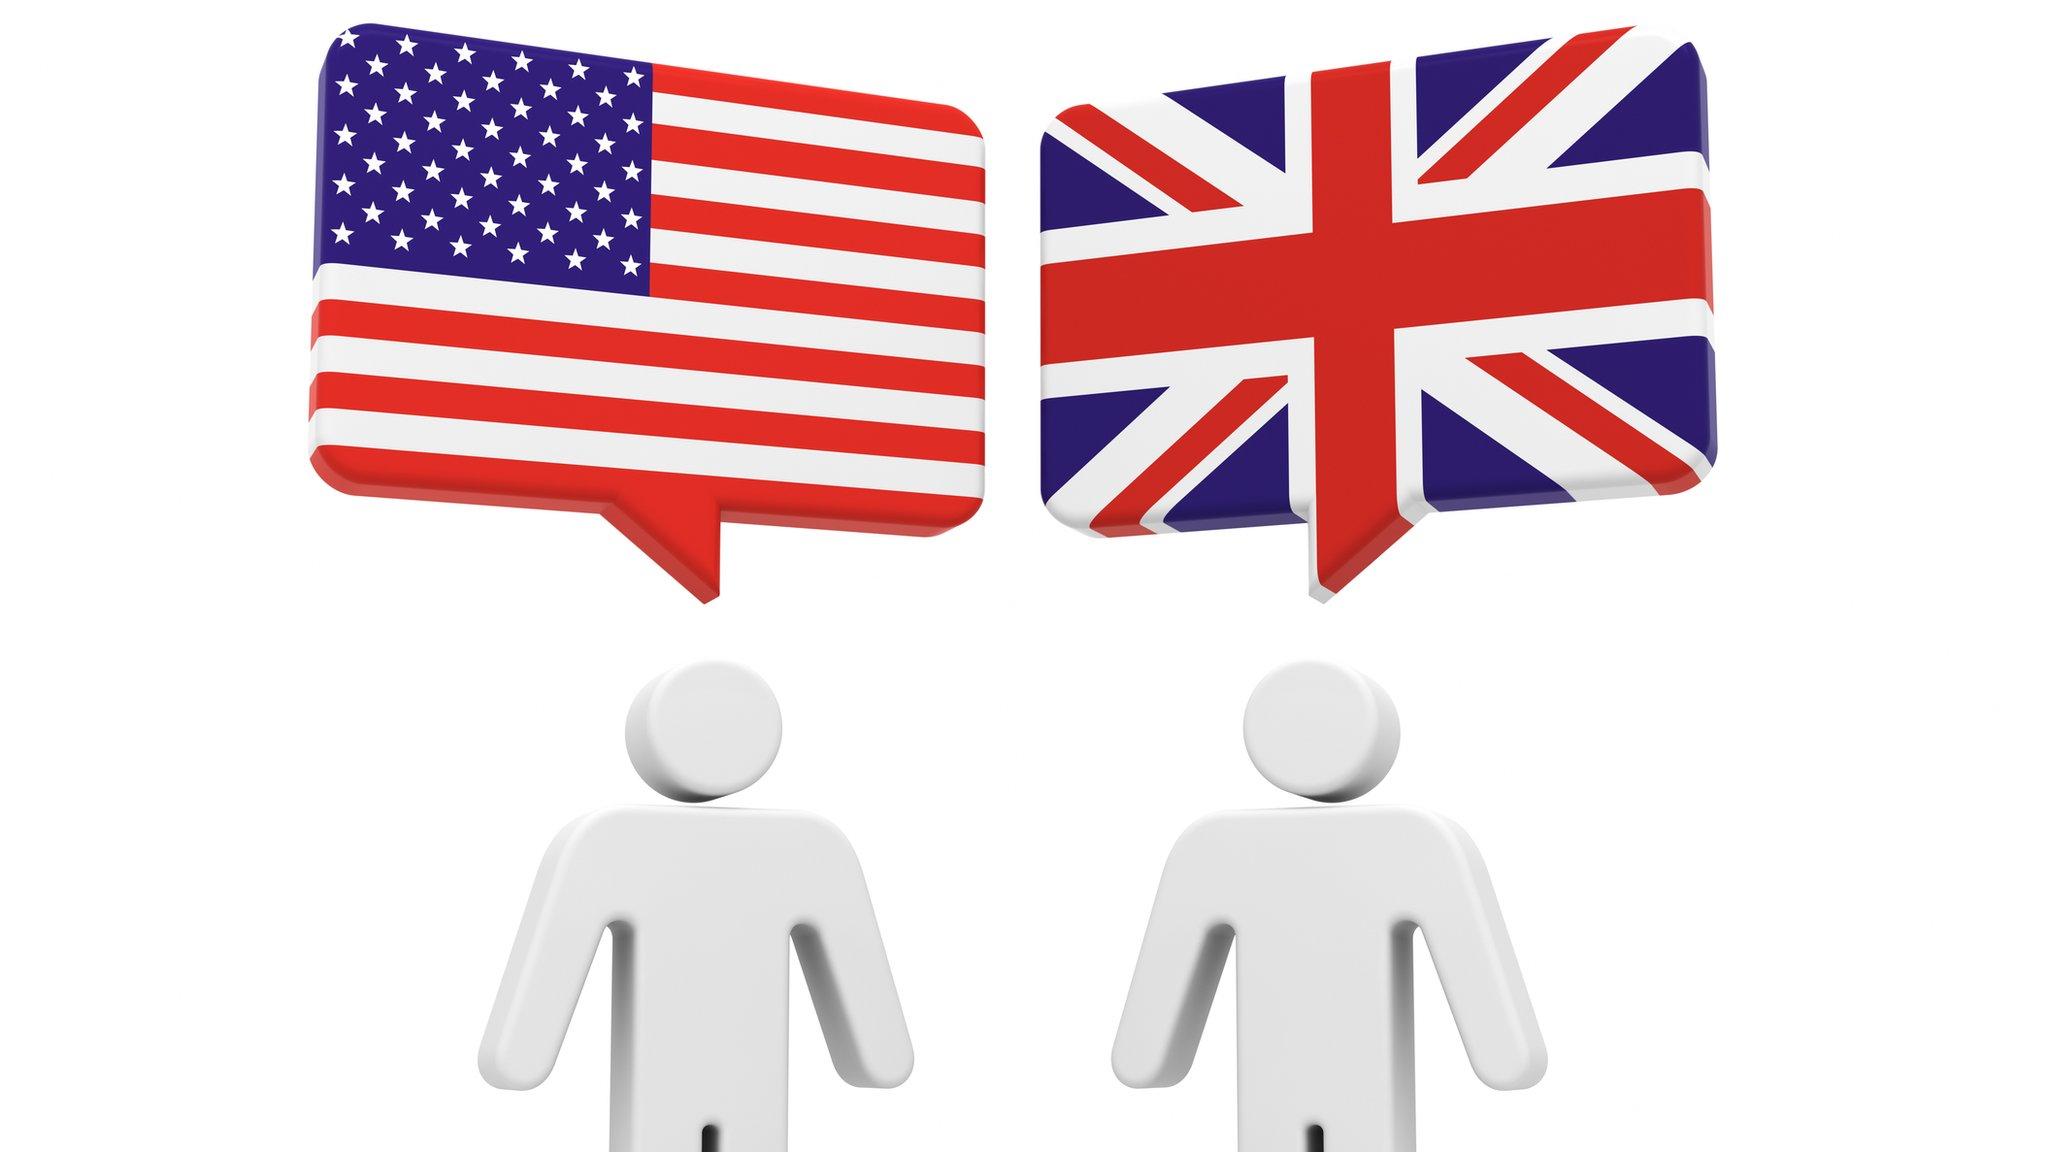 YouGov survey: British sarcasm 'lost on Americans'